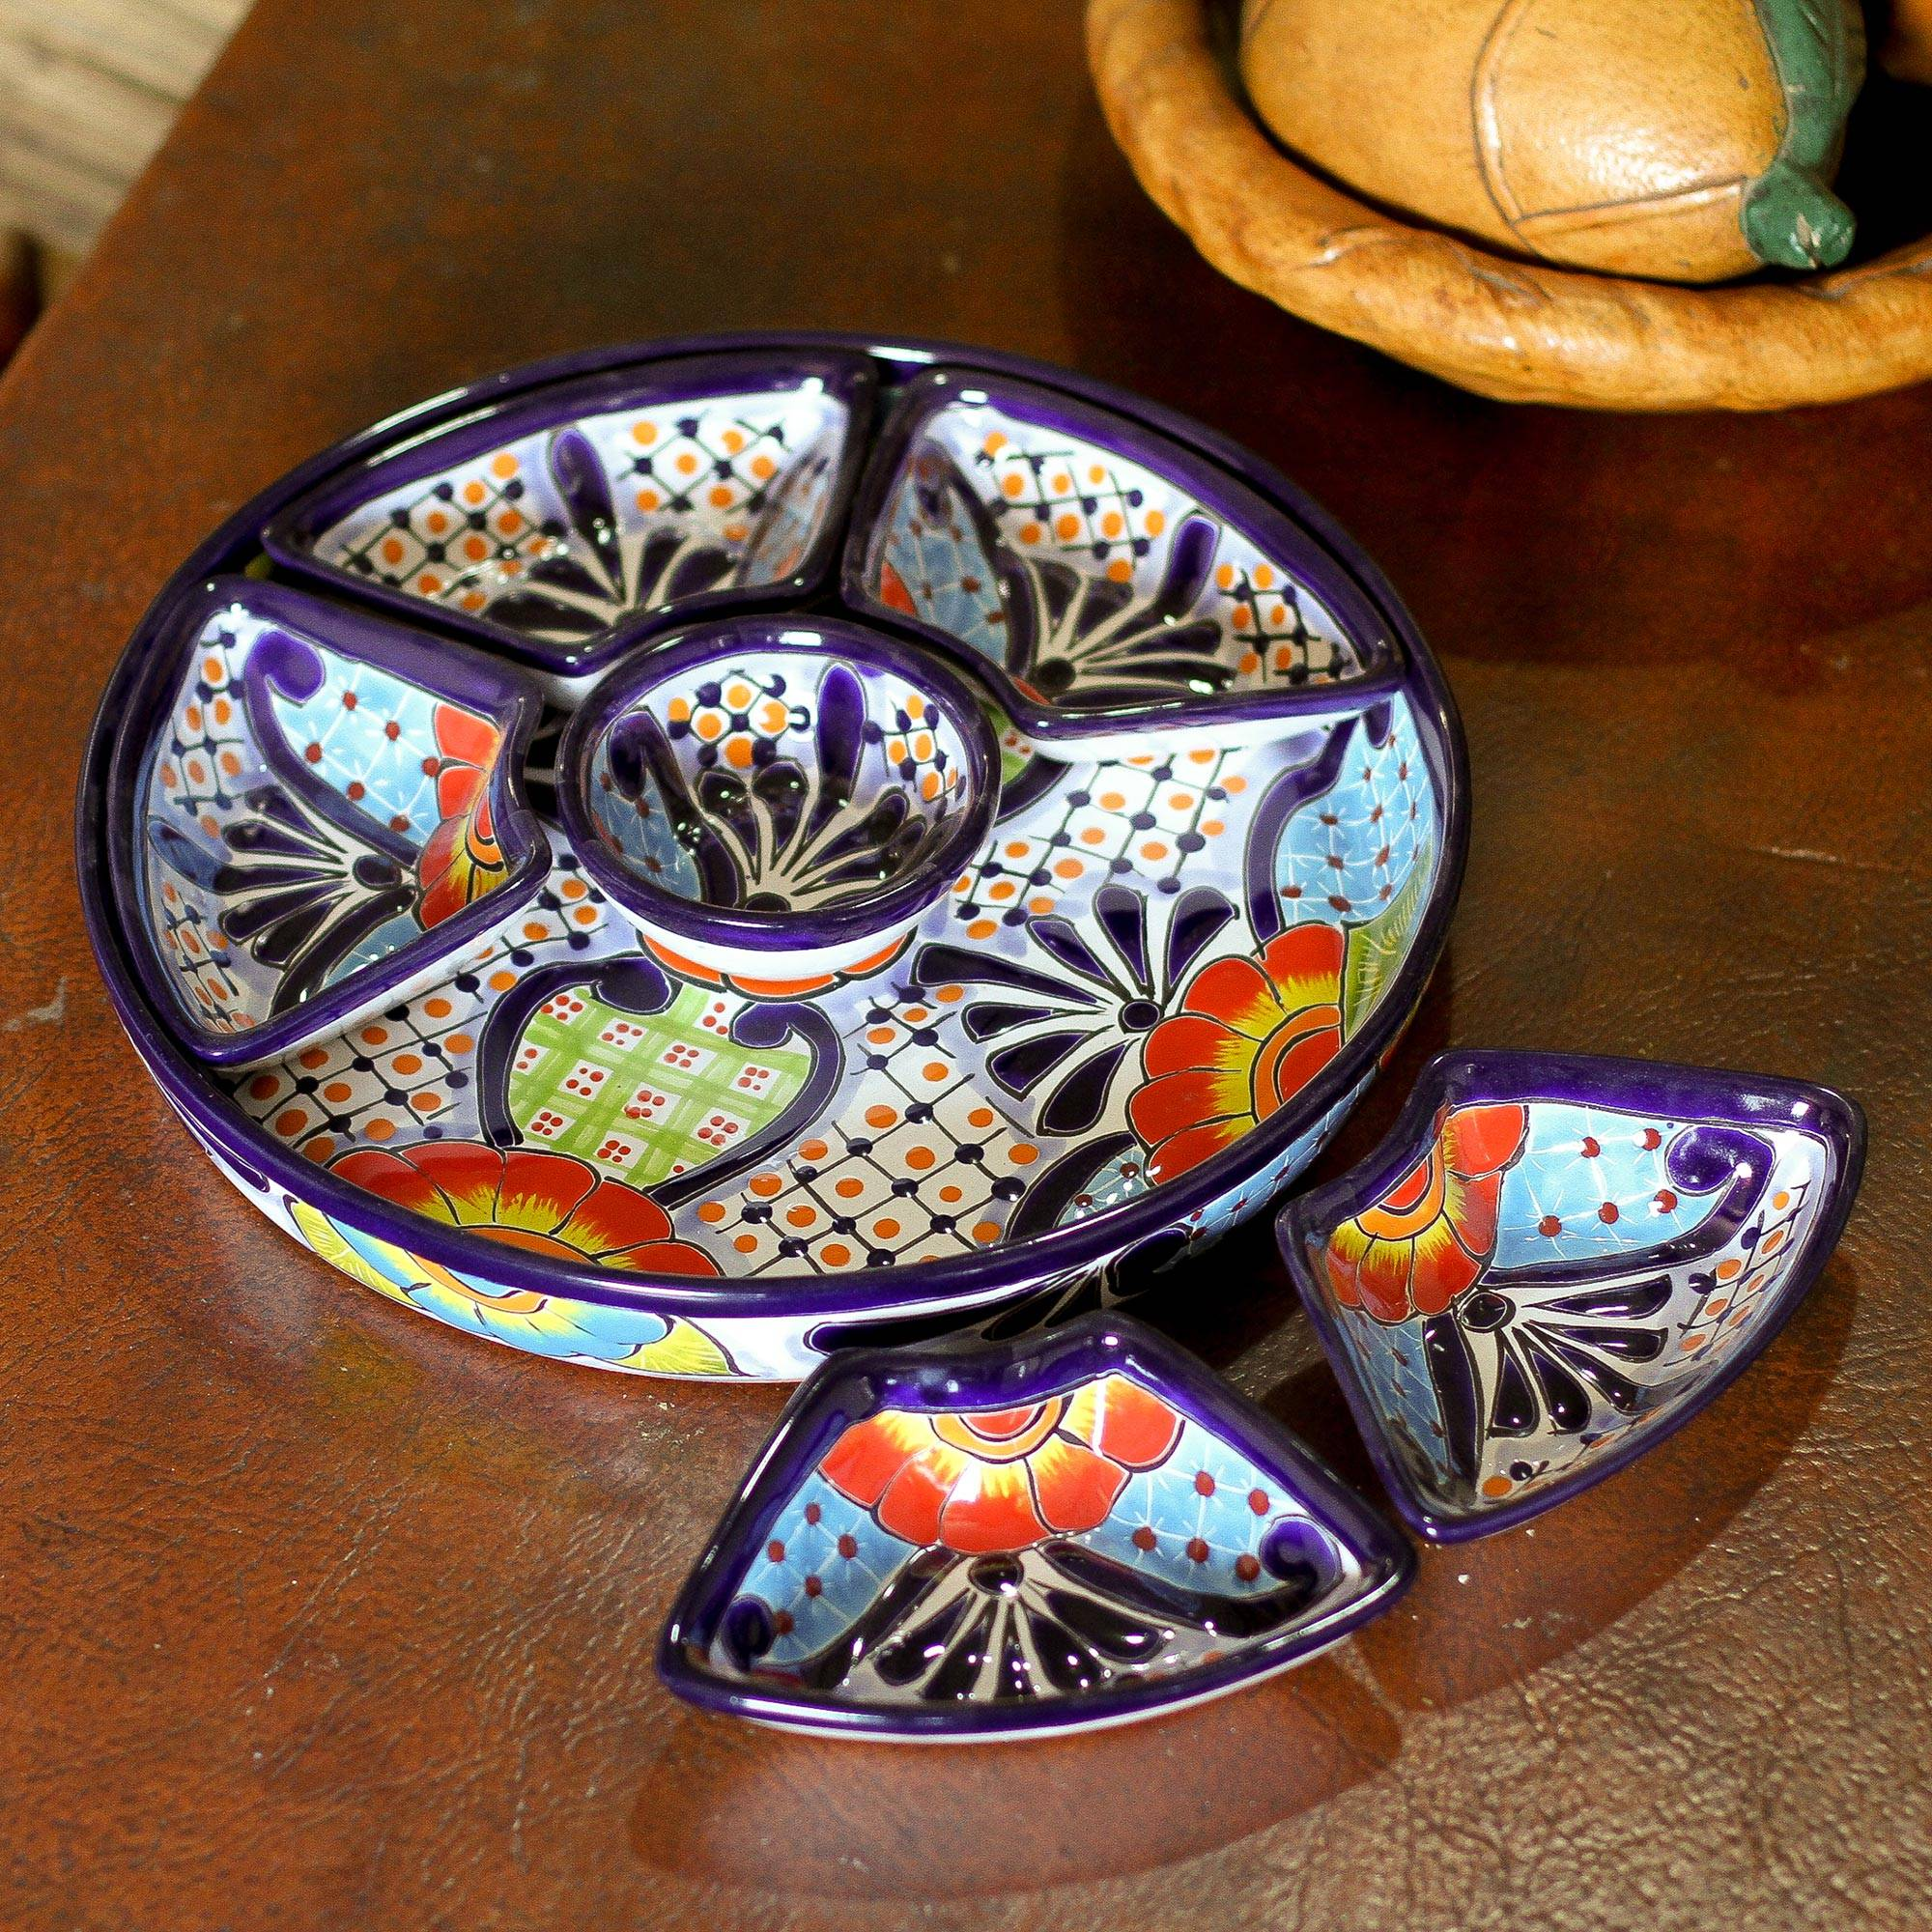 Talavera Style Appetizer Bowl Set From Mexico 7 Piece Festive Flowers Novica